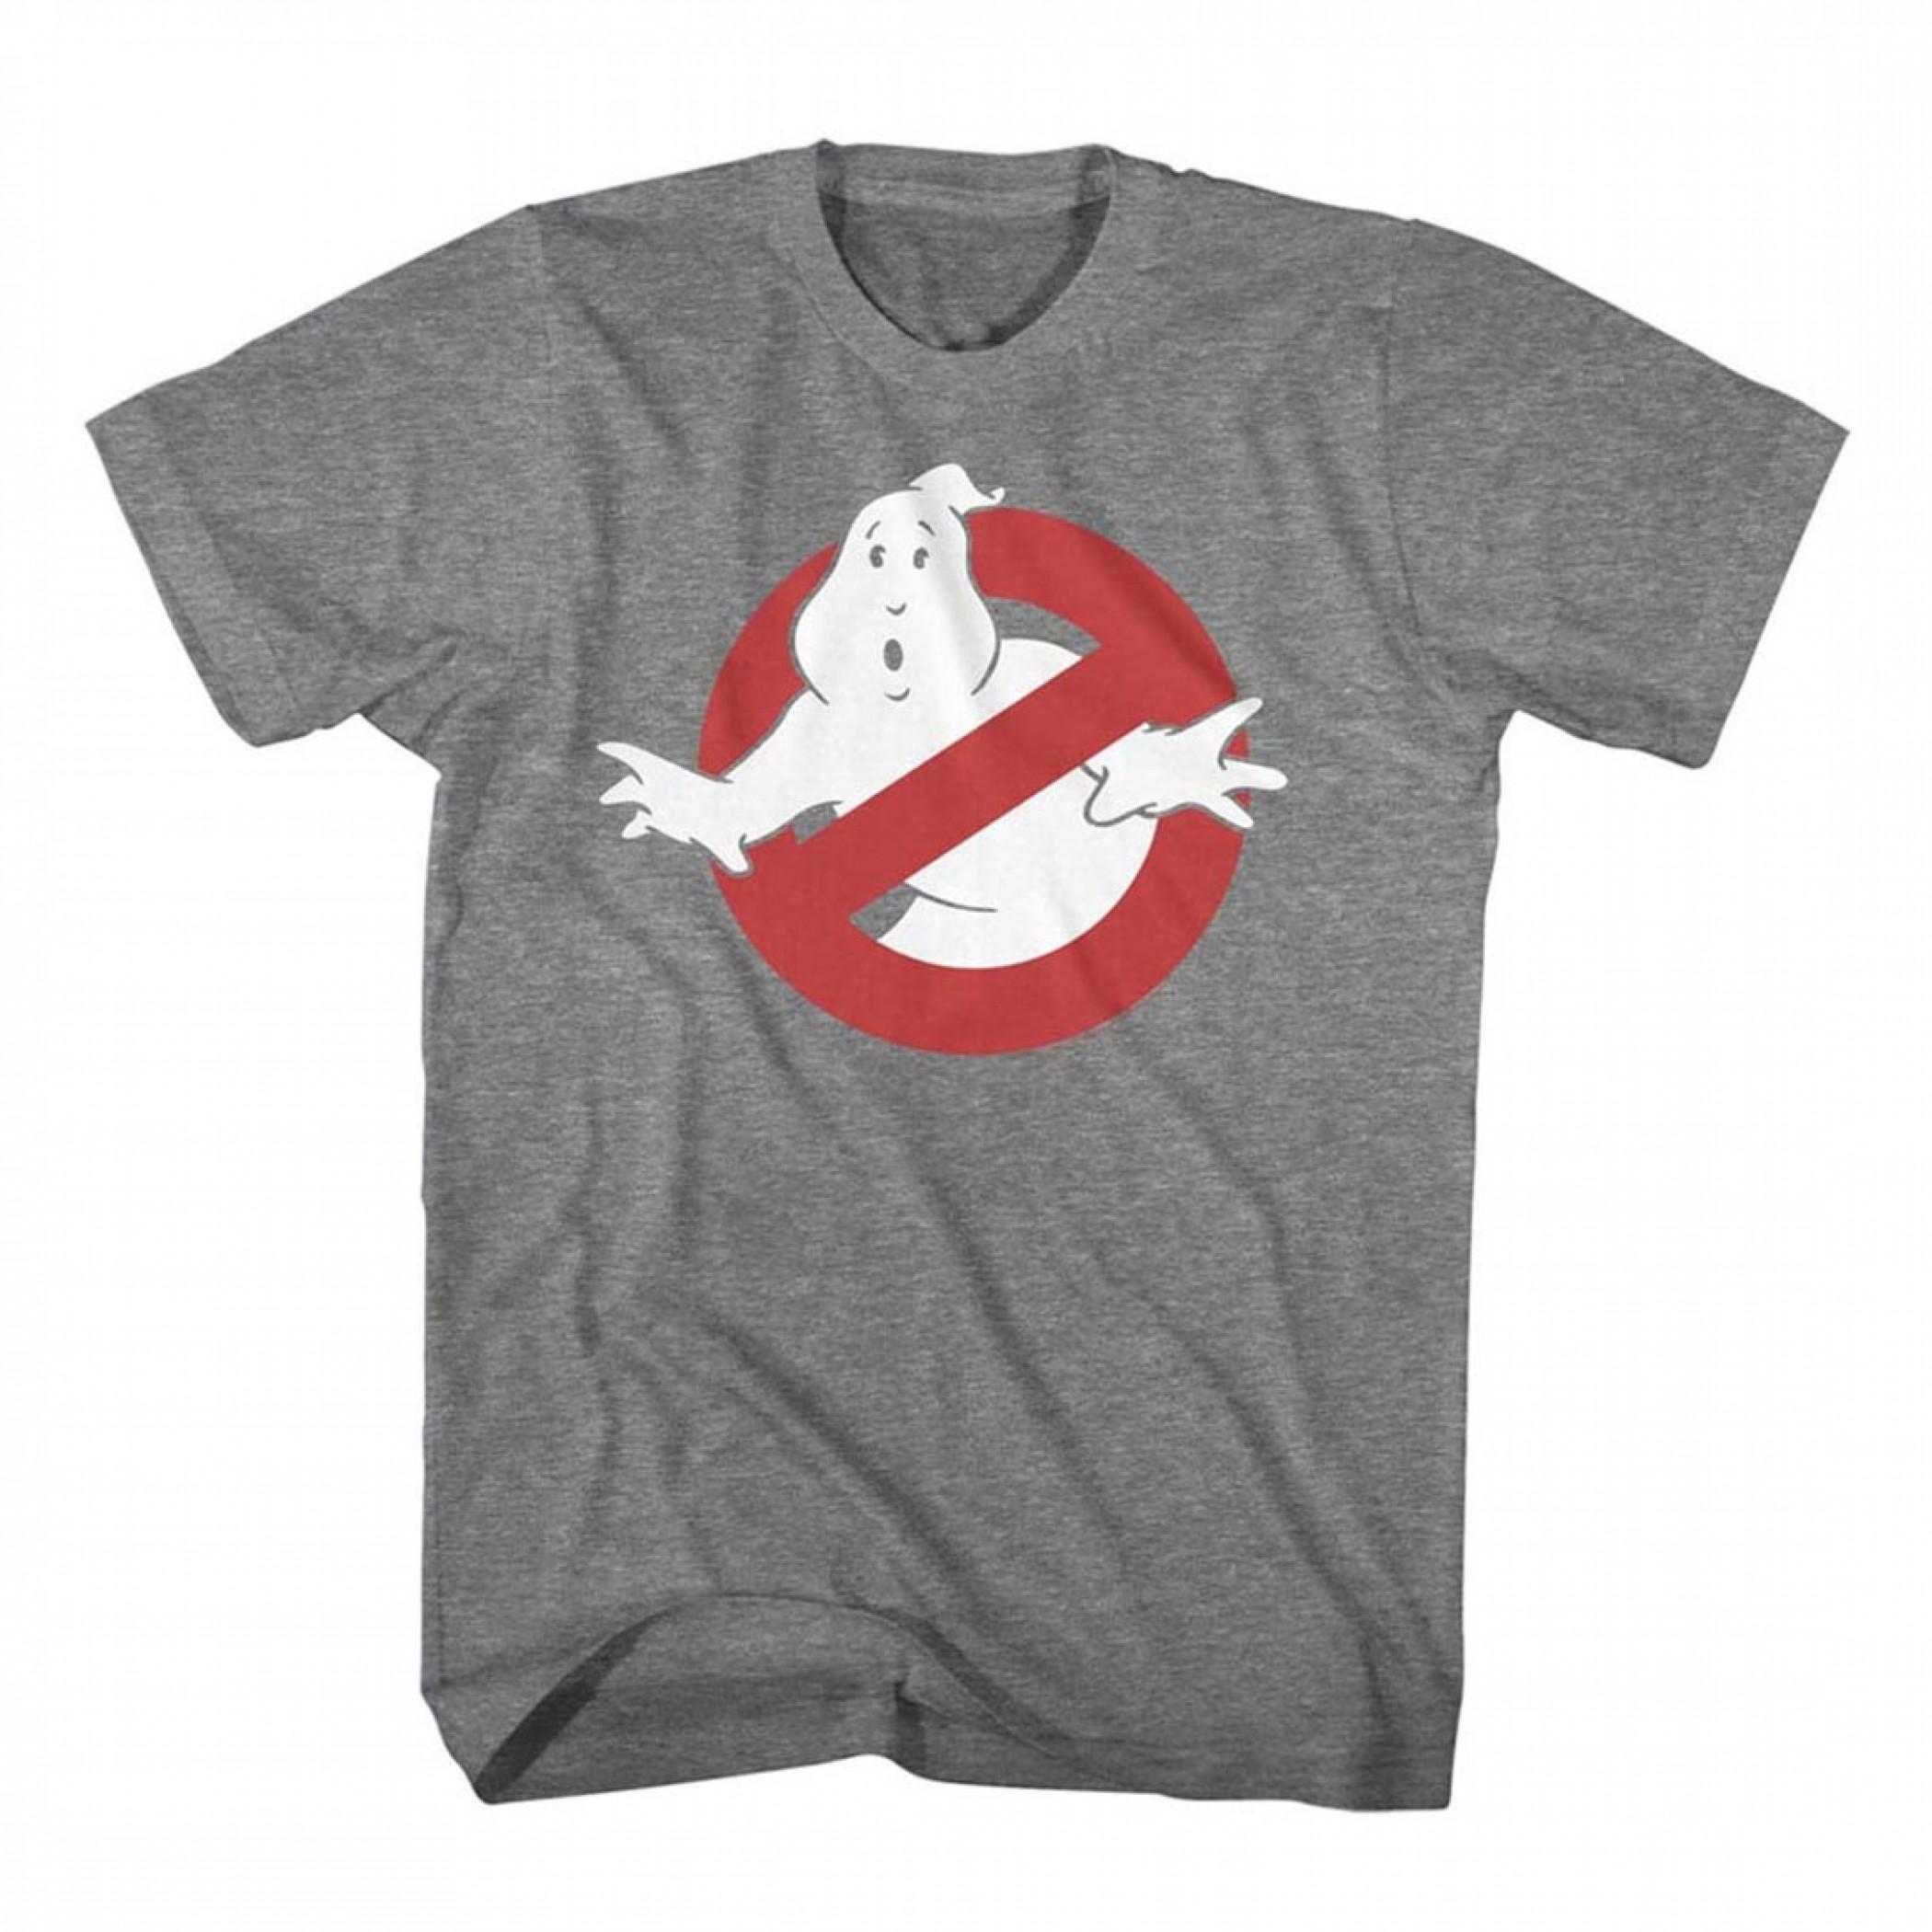 Ghostbusters Logo Tri-Blend T-Shirt